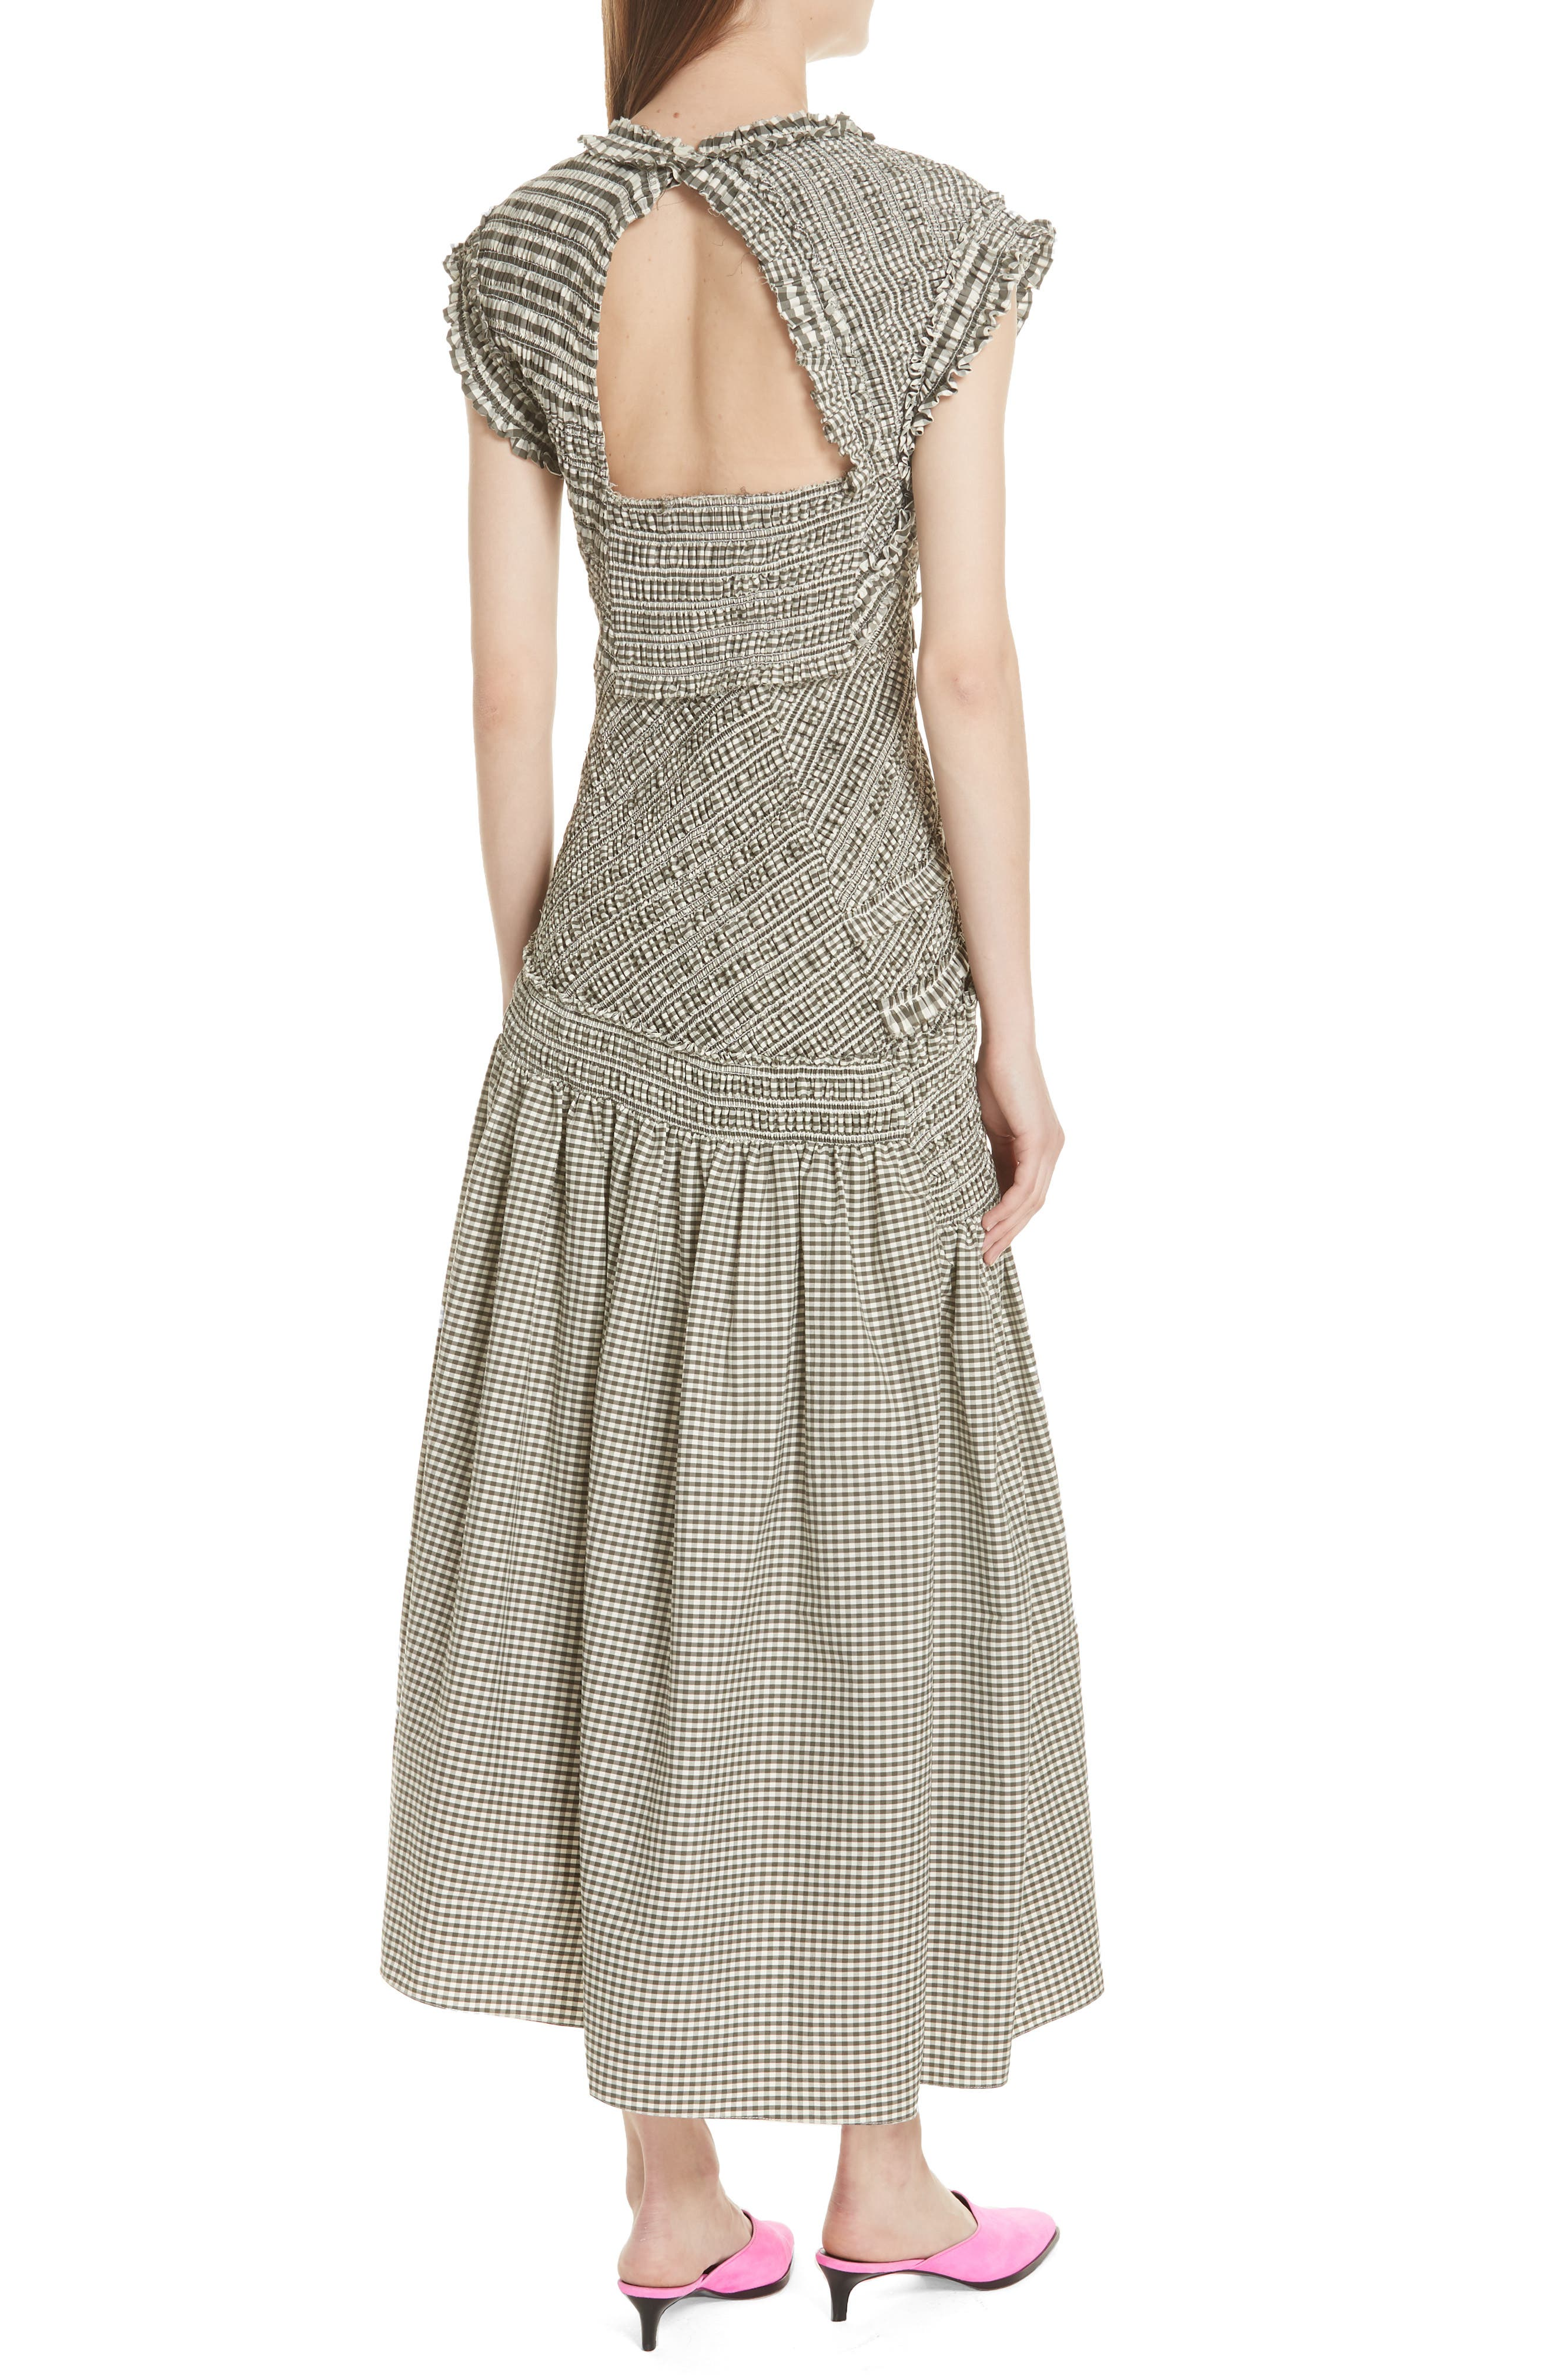 Gathered Gingham Drop Waist Dress,                             Alternate thumbnail 2, color,                             033